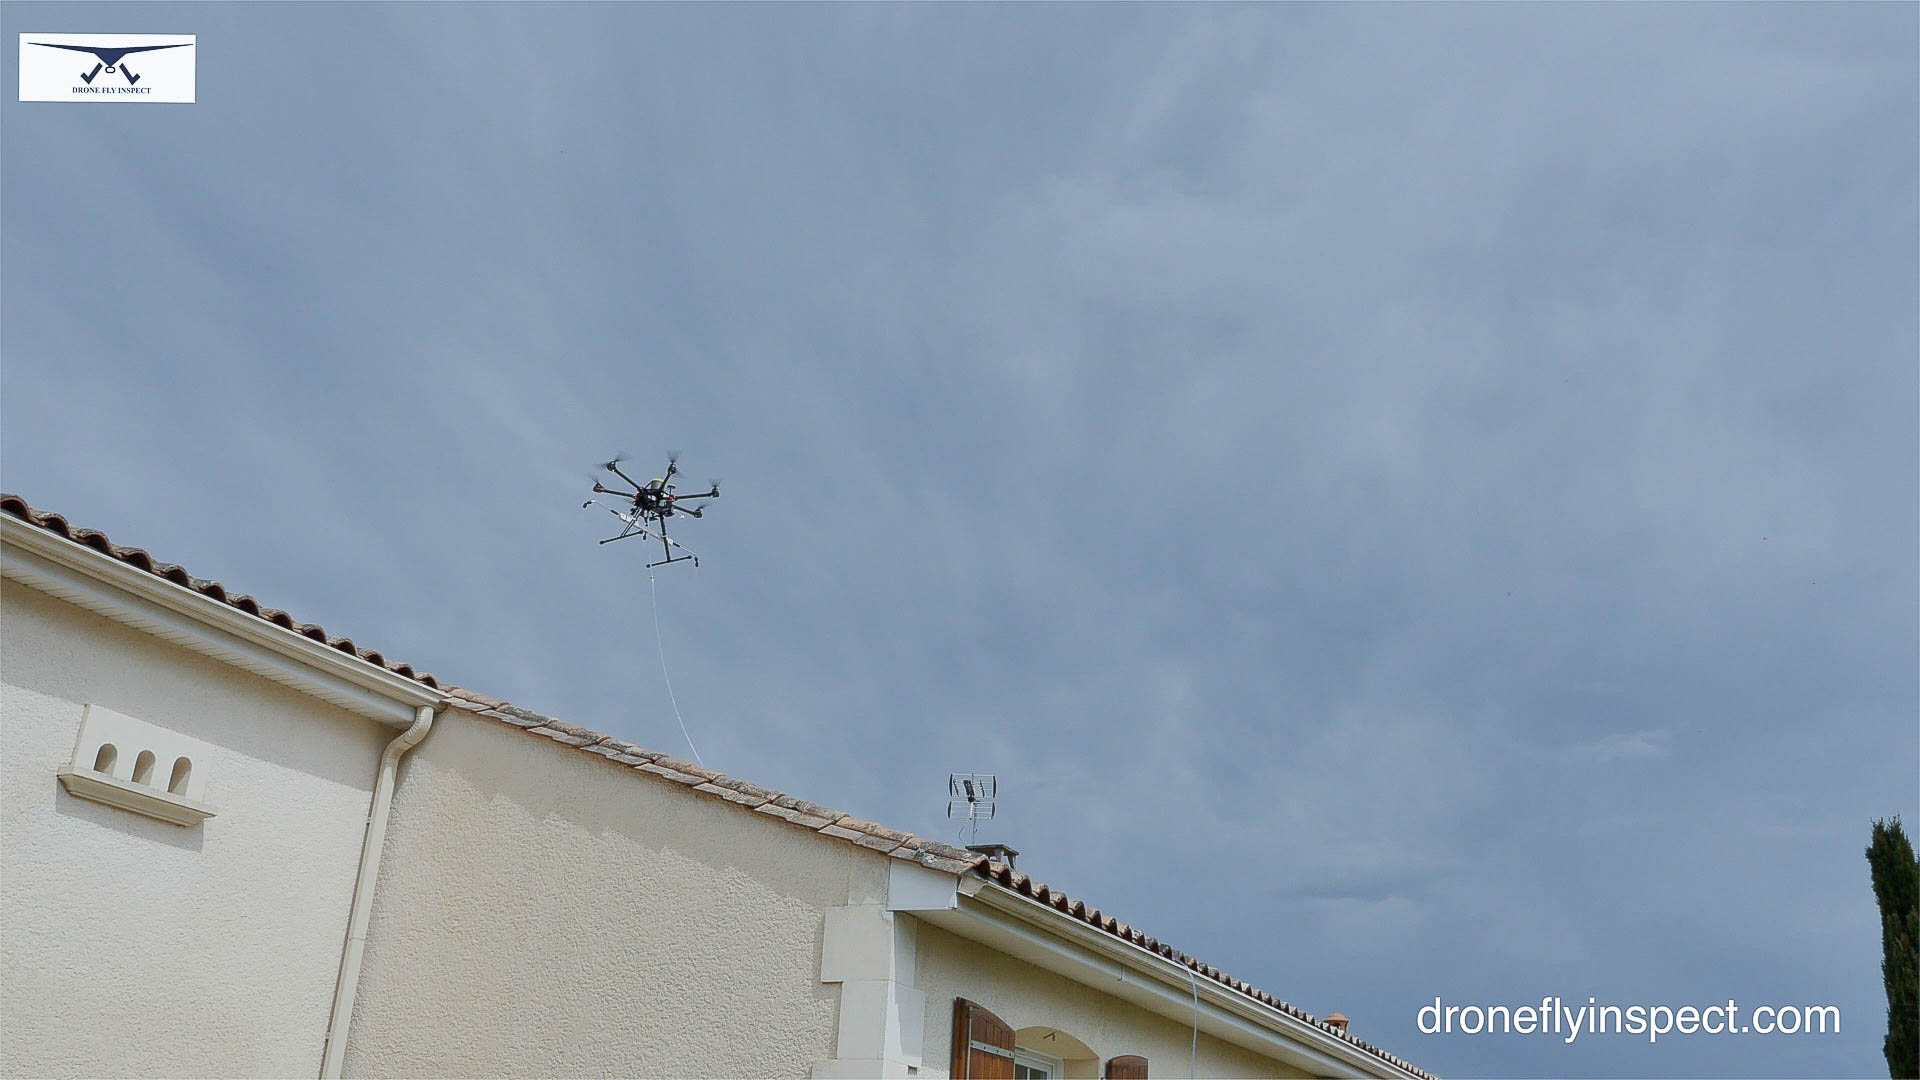 nettoyage de vos toitures par drone drone fly inspect. Black Bedroom Furniture Sets. Home Design Ideas